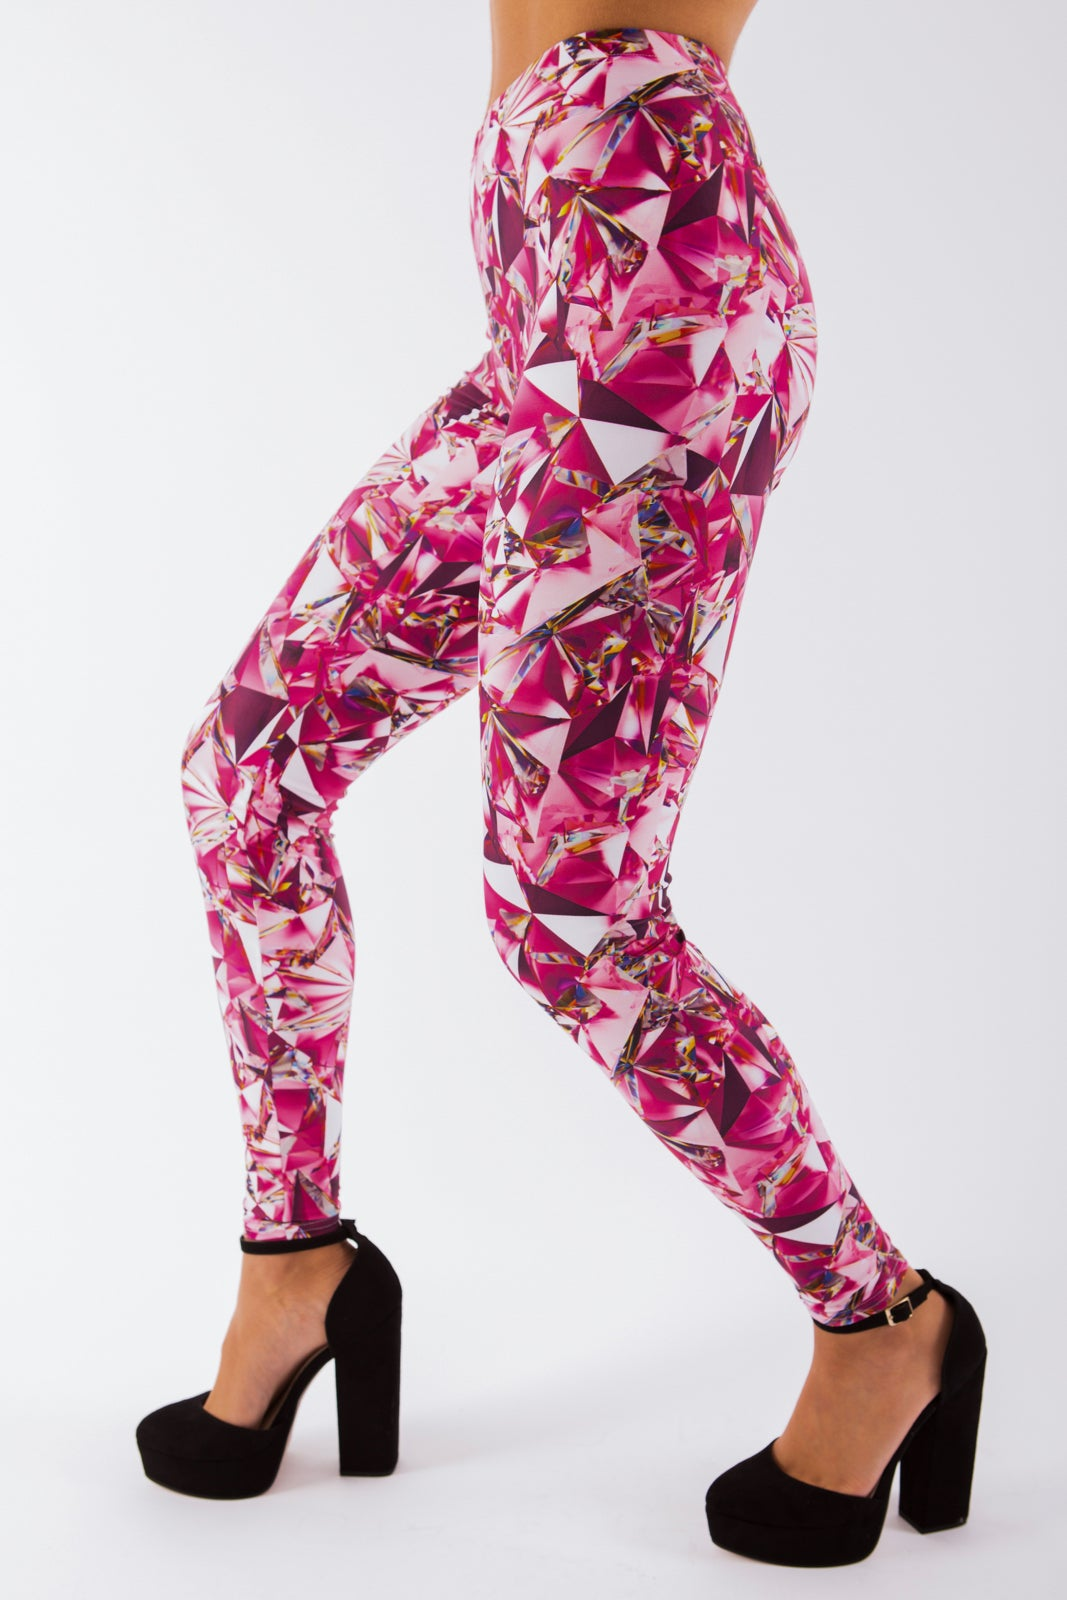 Image of Pink Shattered Glass Leggings